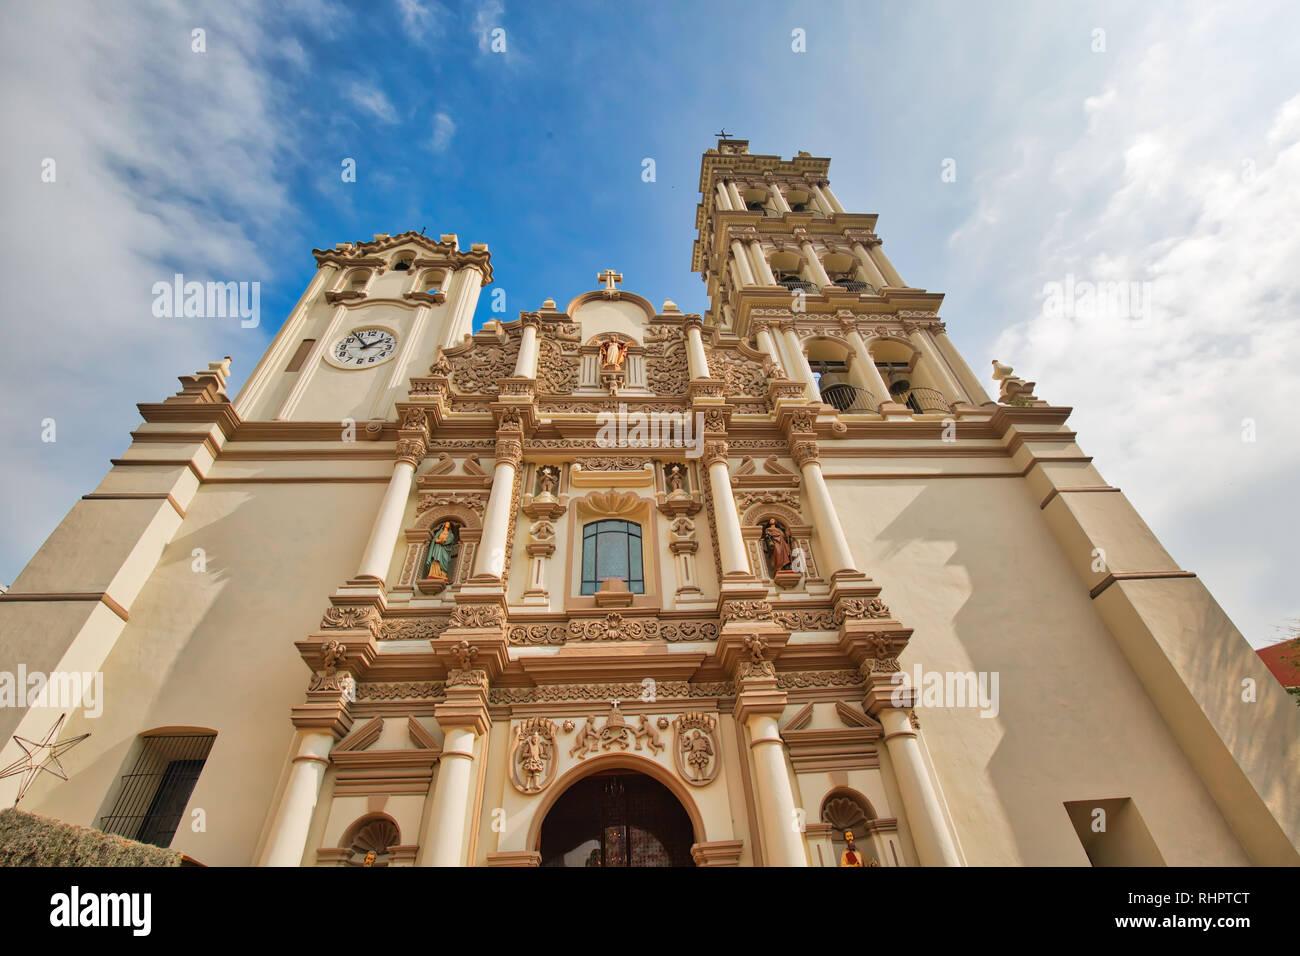 Monterrey, Macroplaza, Metropolitan Cathedral (Catedral Metropolitana de Monterrey) Stock Photo